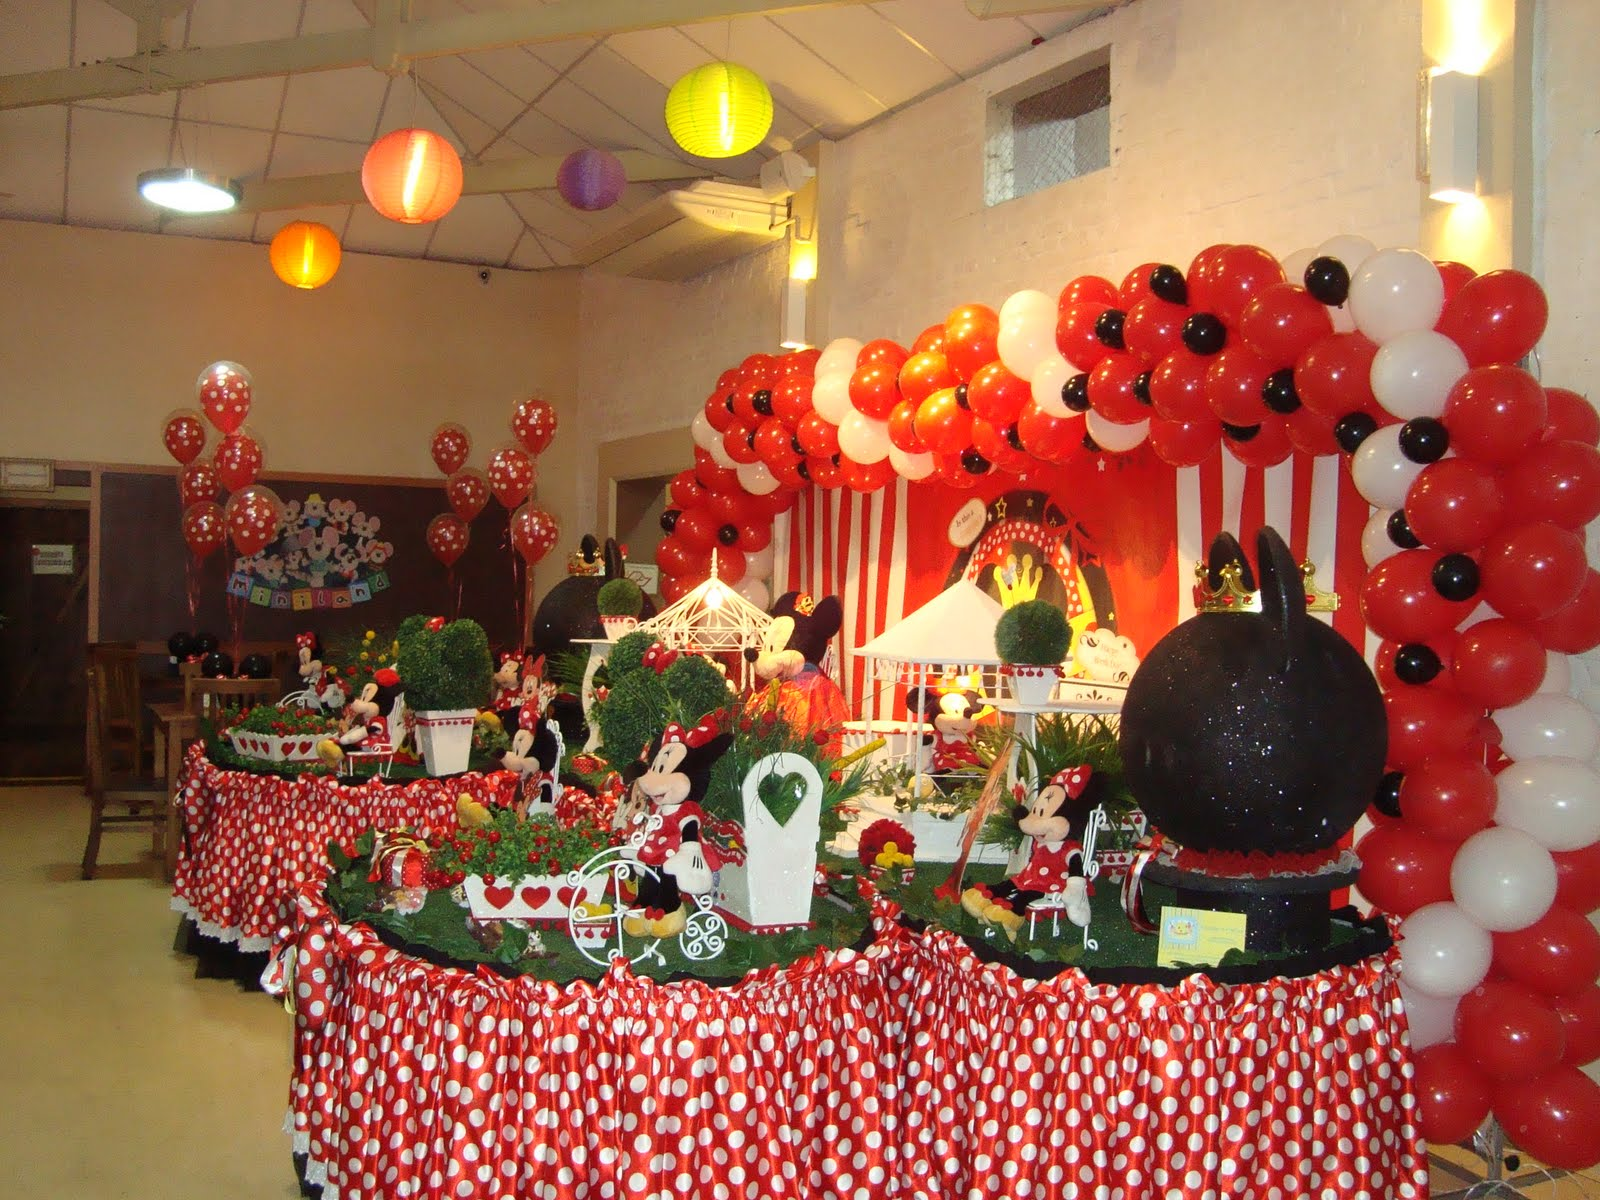 decoracao festa infantil yellow submarine:Blog do buffet infantil Miniland Tatuapé: Miniland buffet – Festas